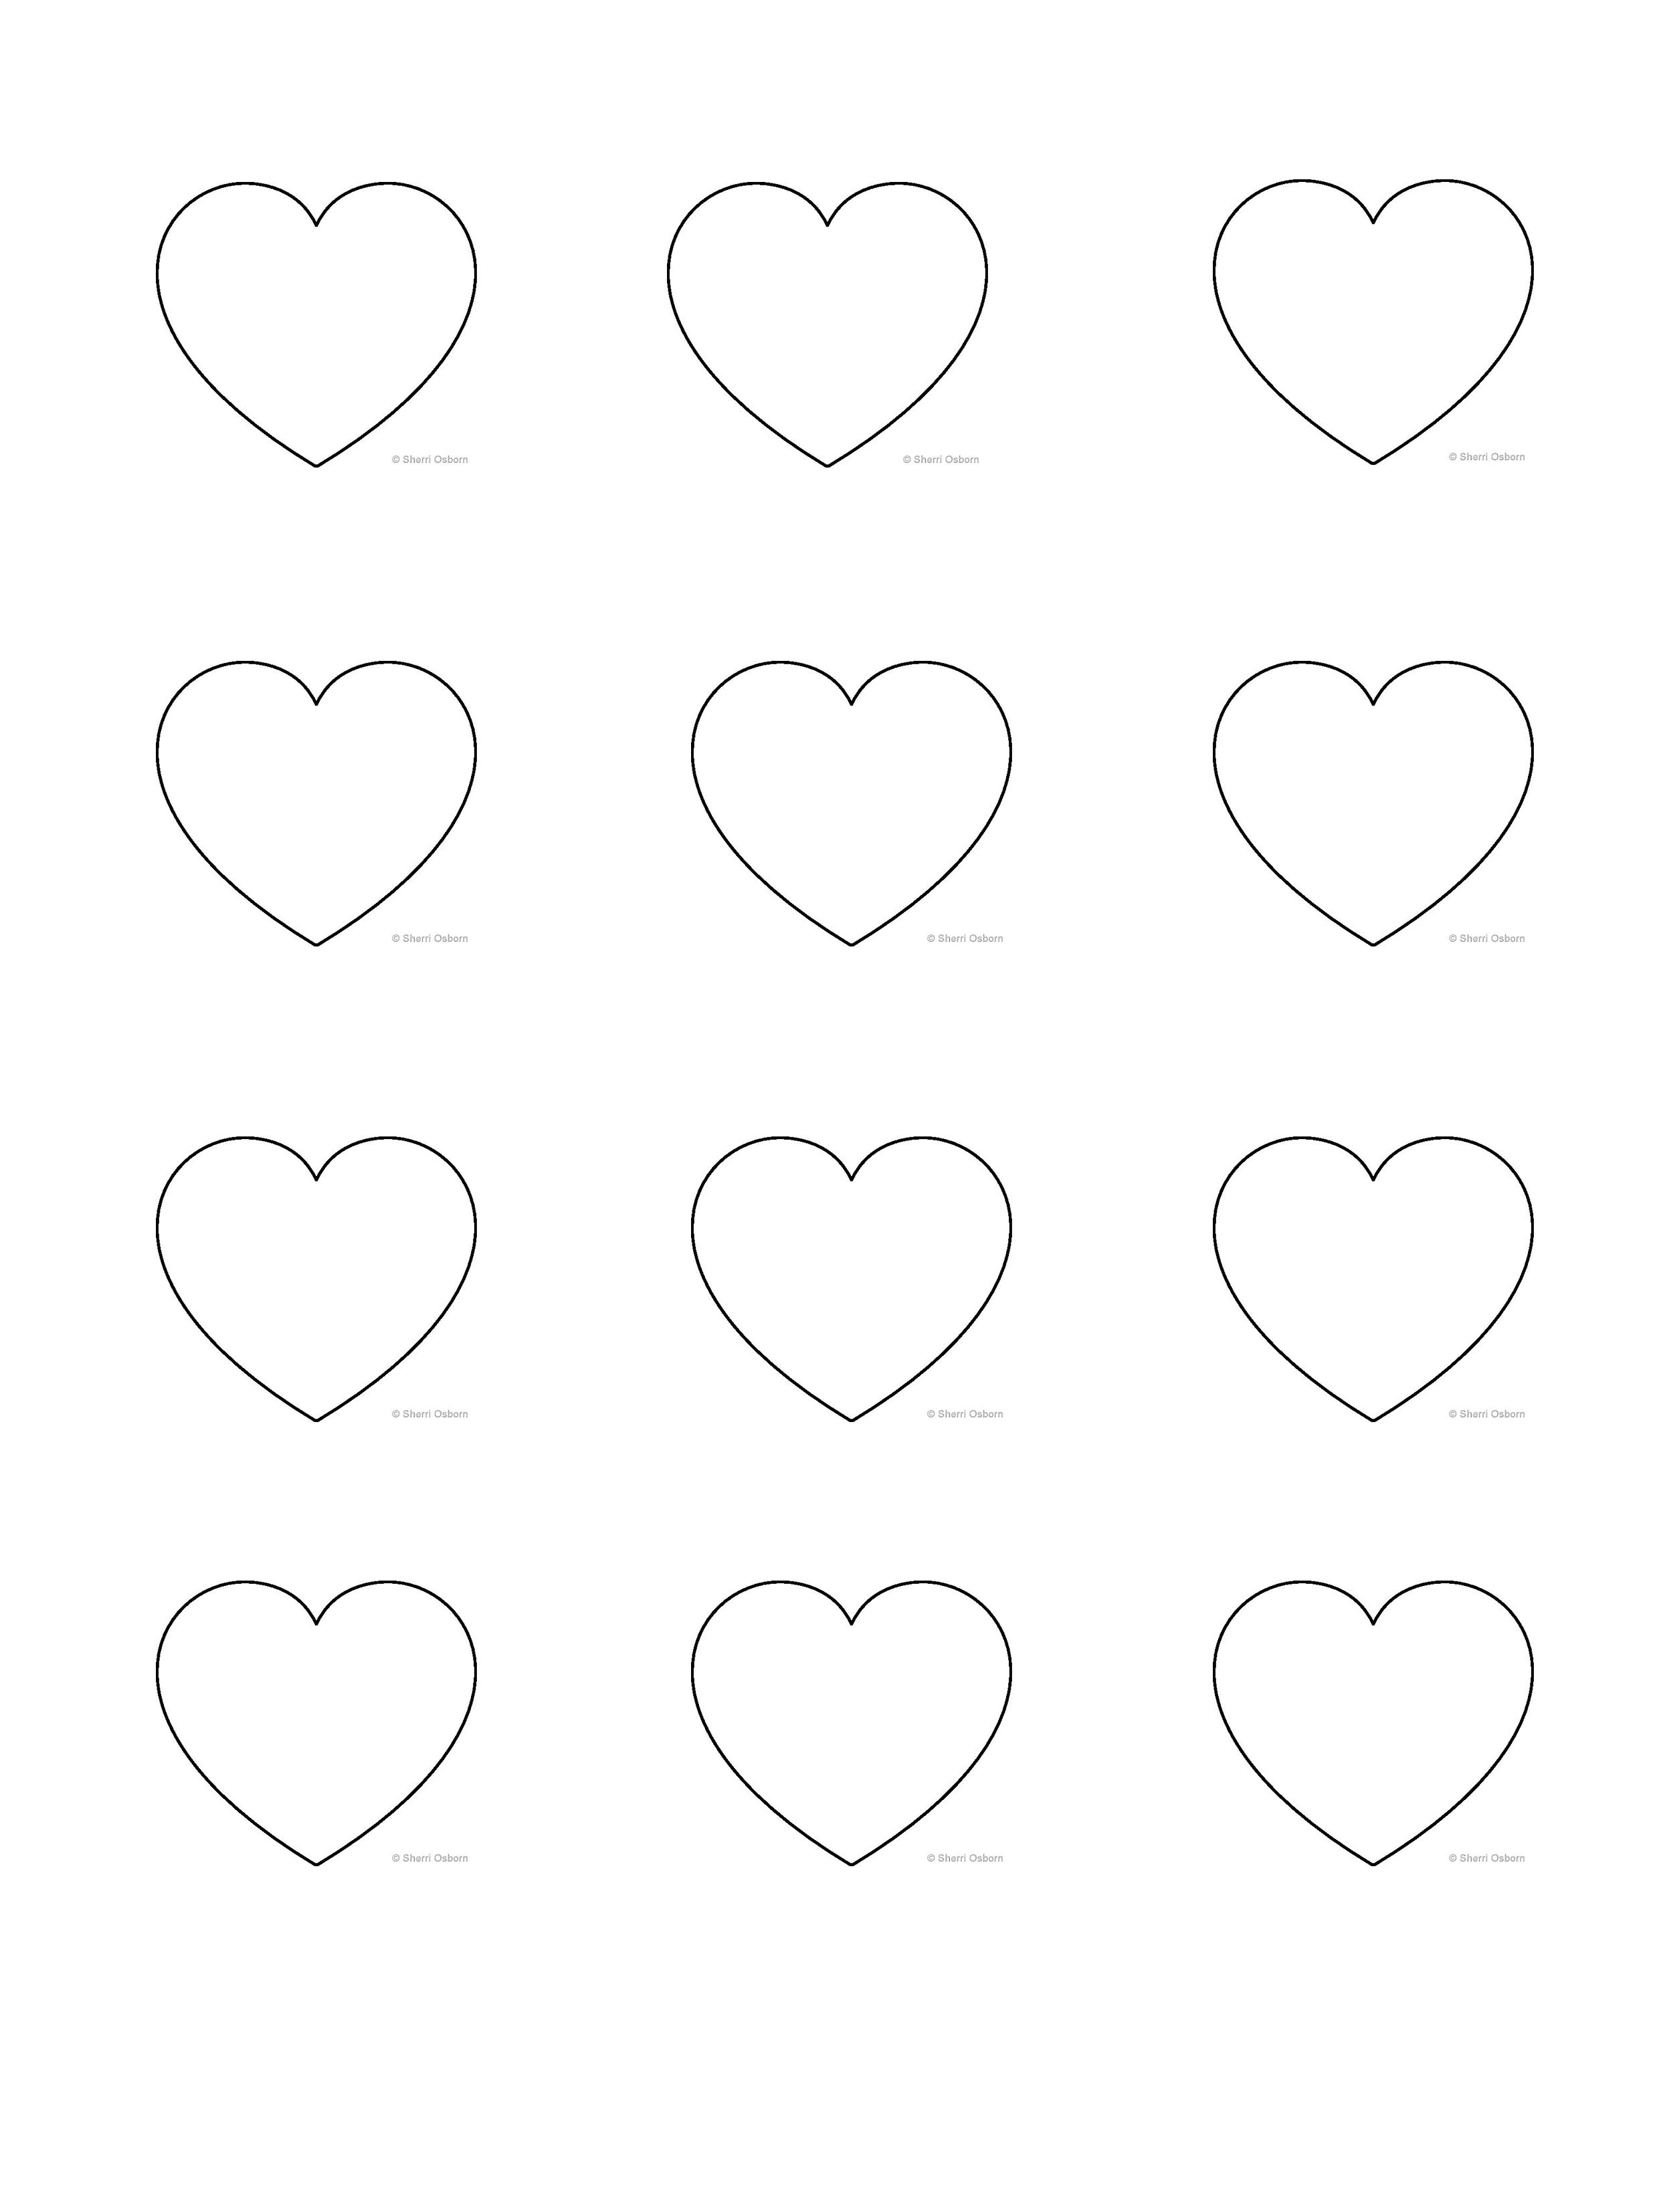 Heart Shape Template 38cm French Macarons Pinterest Macaron